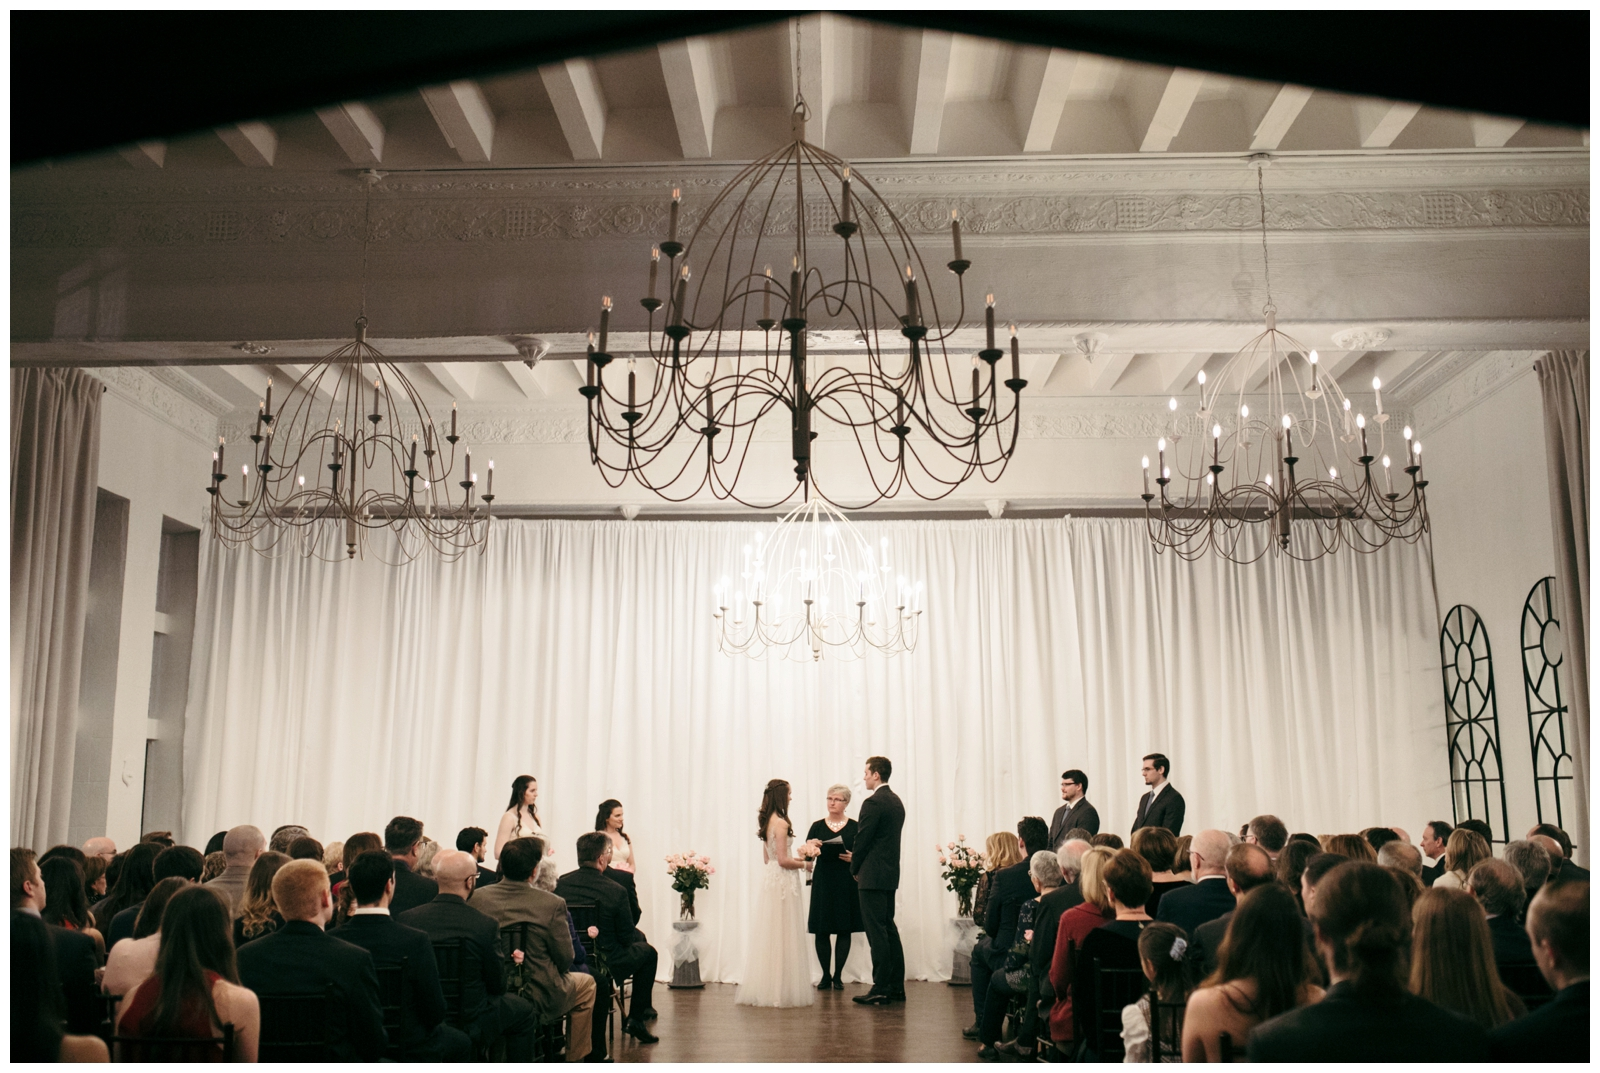 Alden-Castle-Wedding-Boston-Bailey-Q-Photo-016.jpg